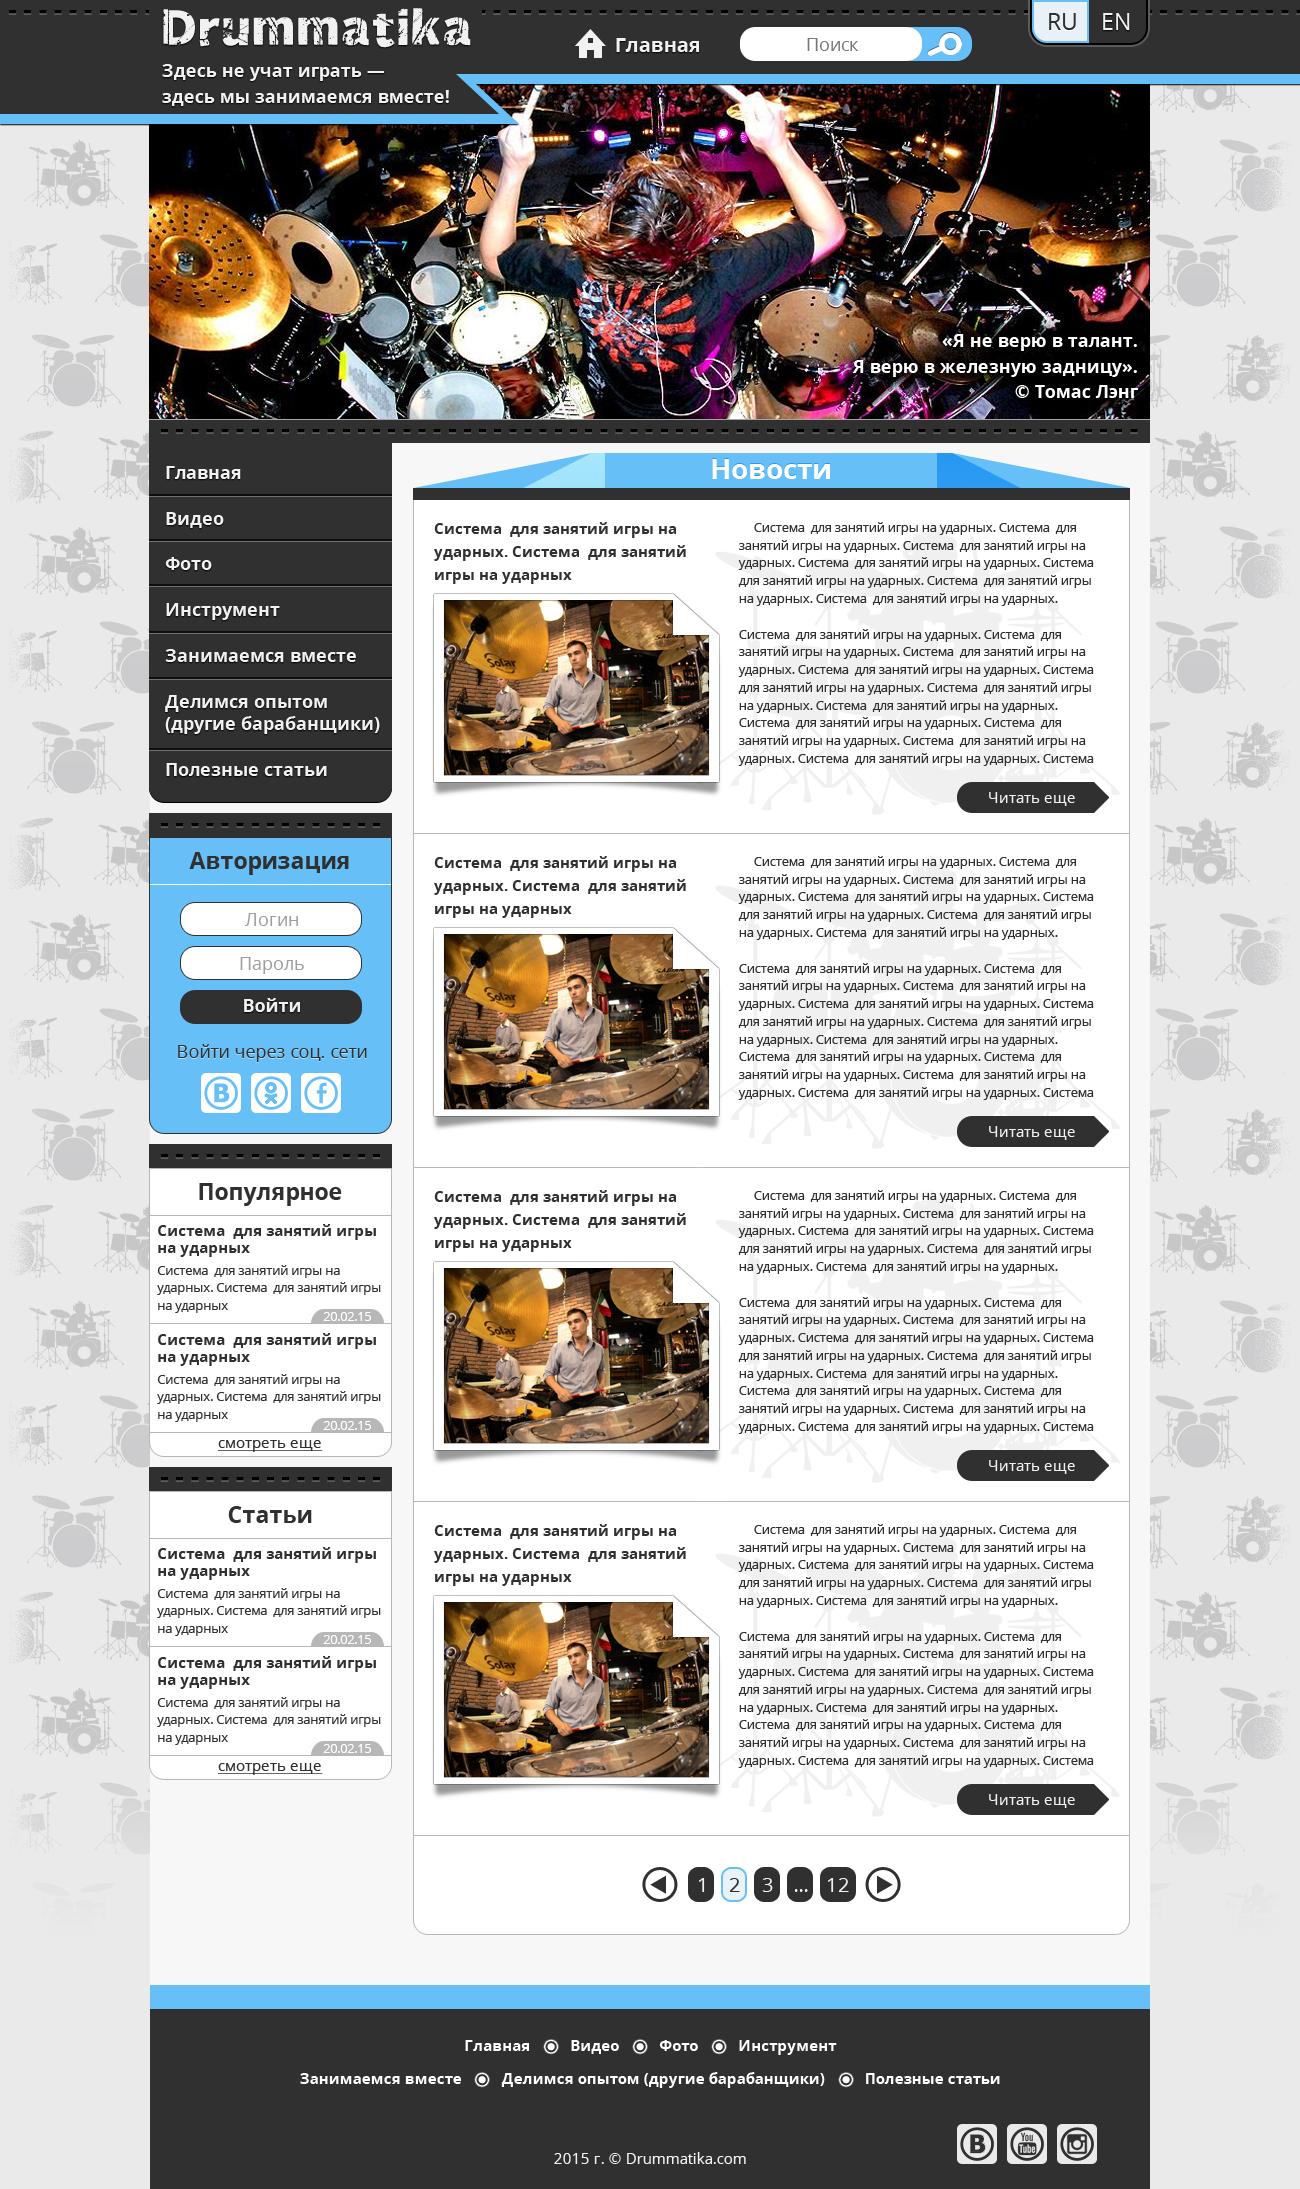 Дизайн блога Drummatika